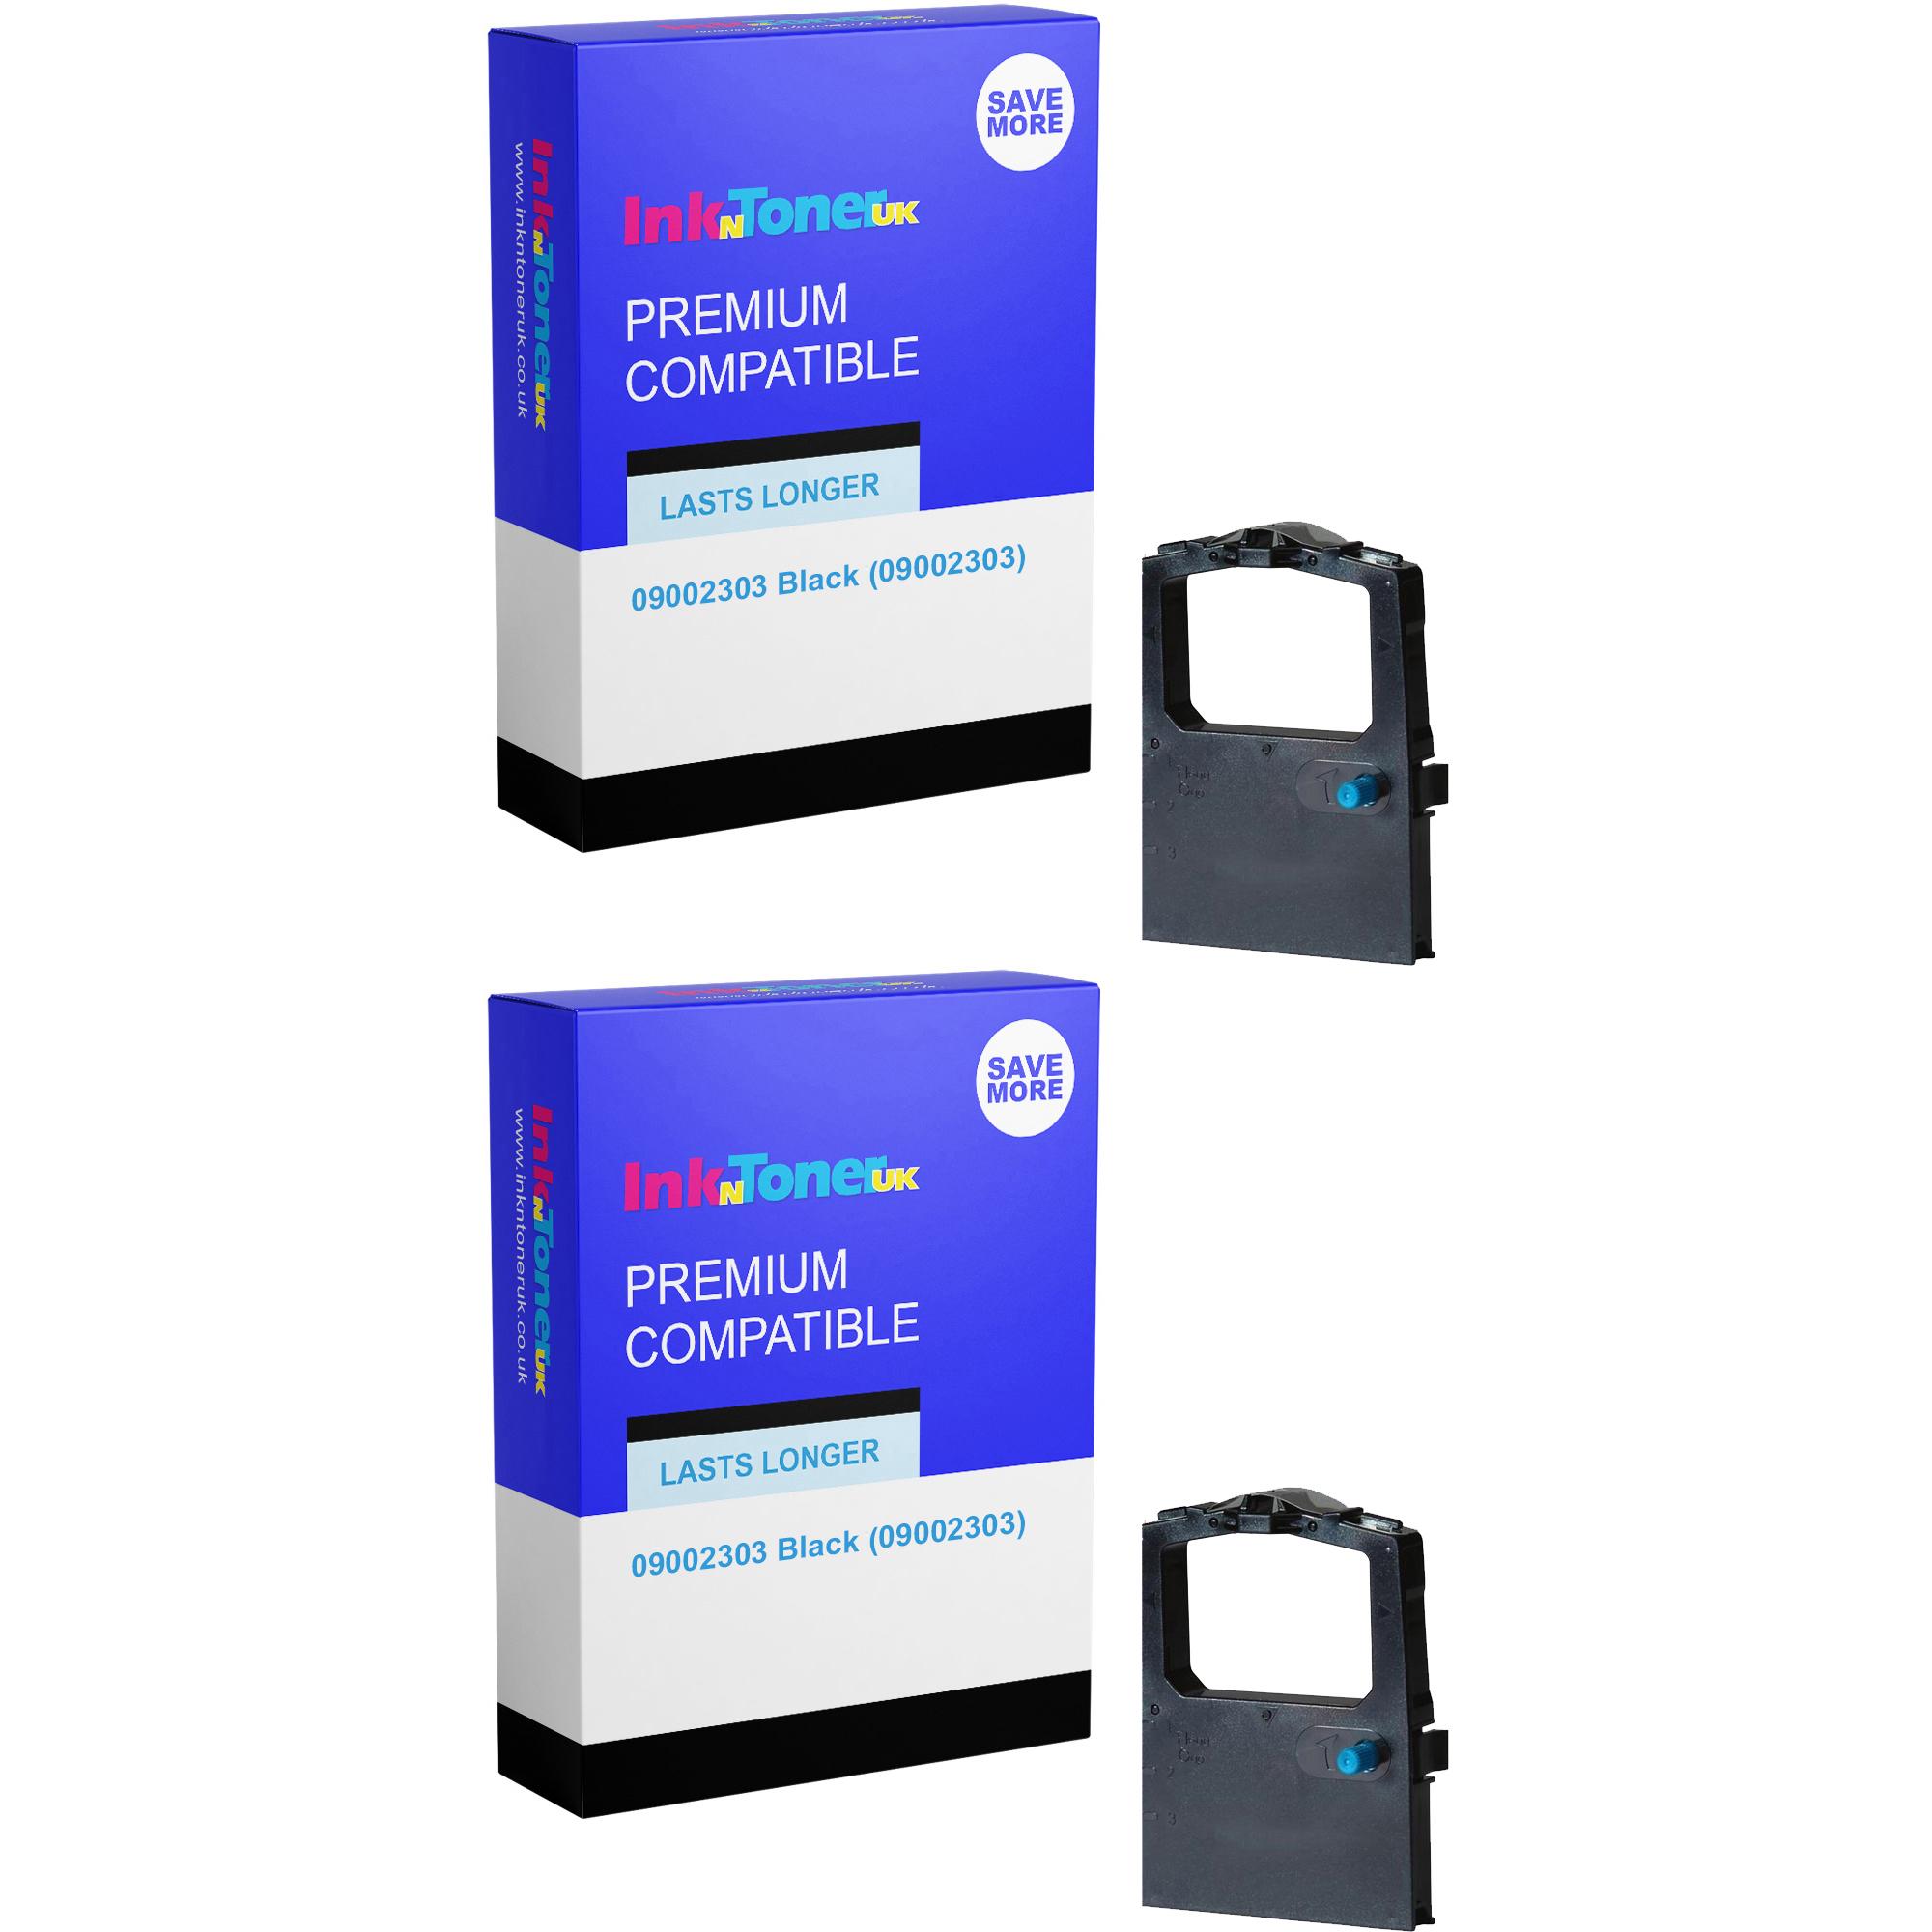 Premium Compatible OKI 09002303 Black Twin Pack Fabric Ink Ribbons (09002303)